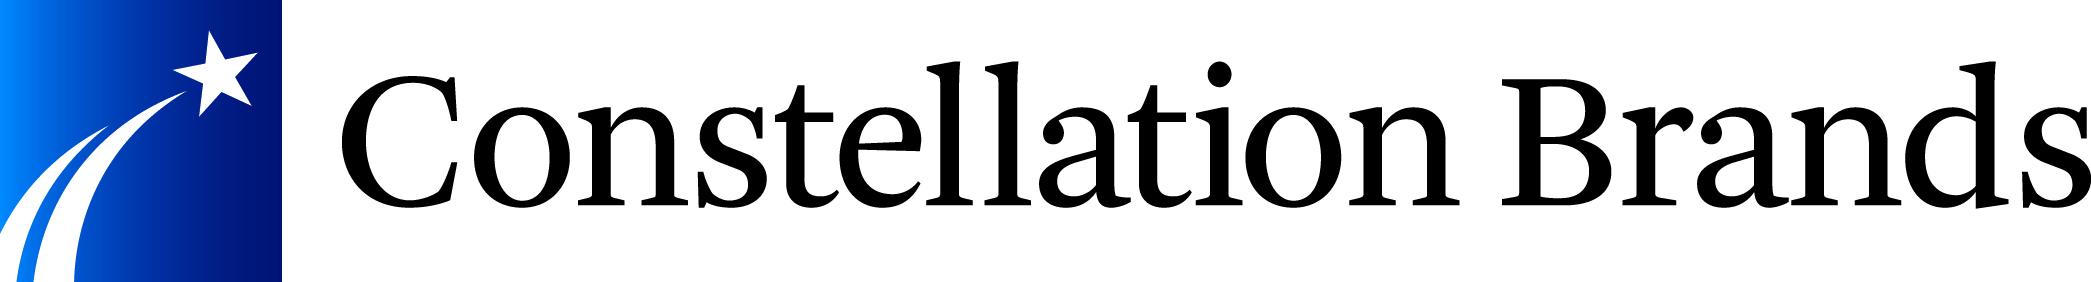 Constellation Brands (2016)- 4_Color_Horiz_1_Line(R).jpg